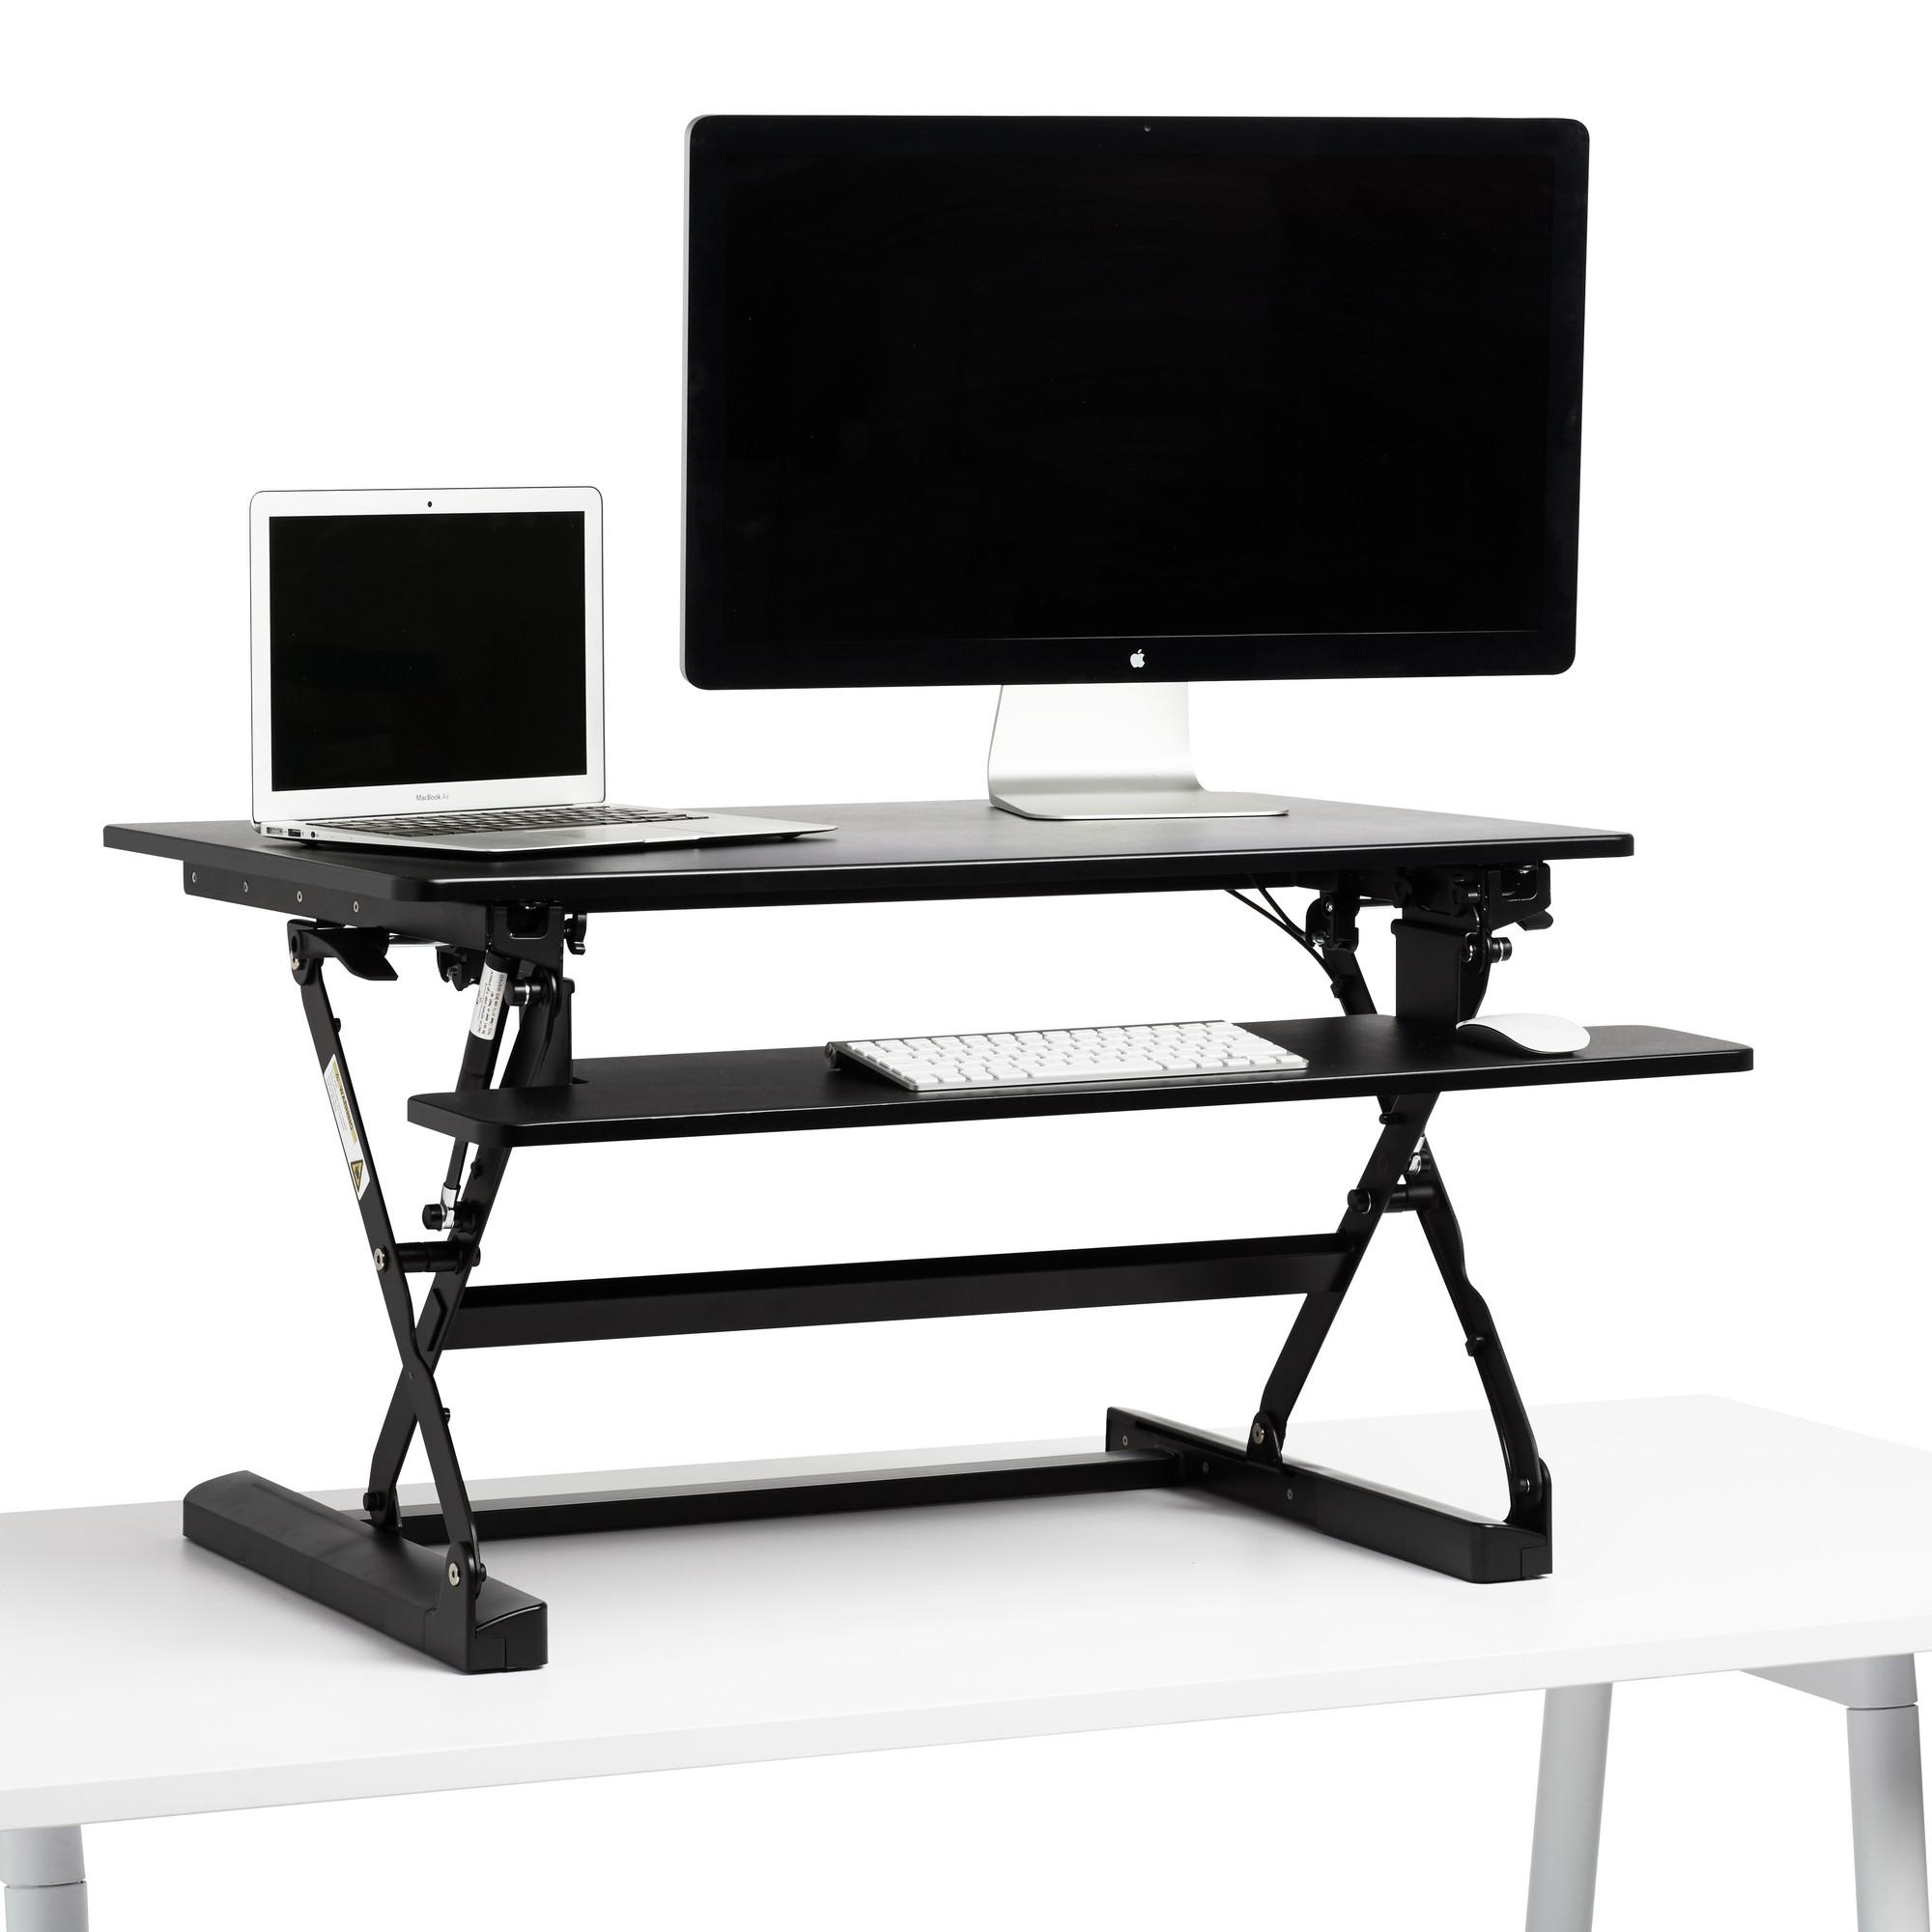 Black Medium Peak Adjustable Height Standing Desk Riser,Black,hi Res.  Loading Zoom